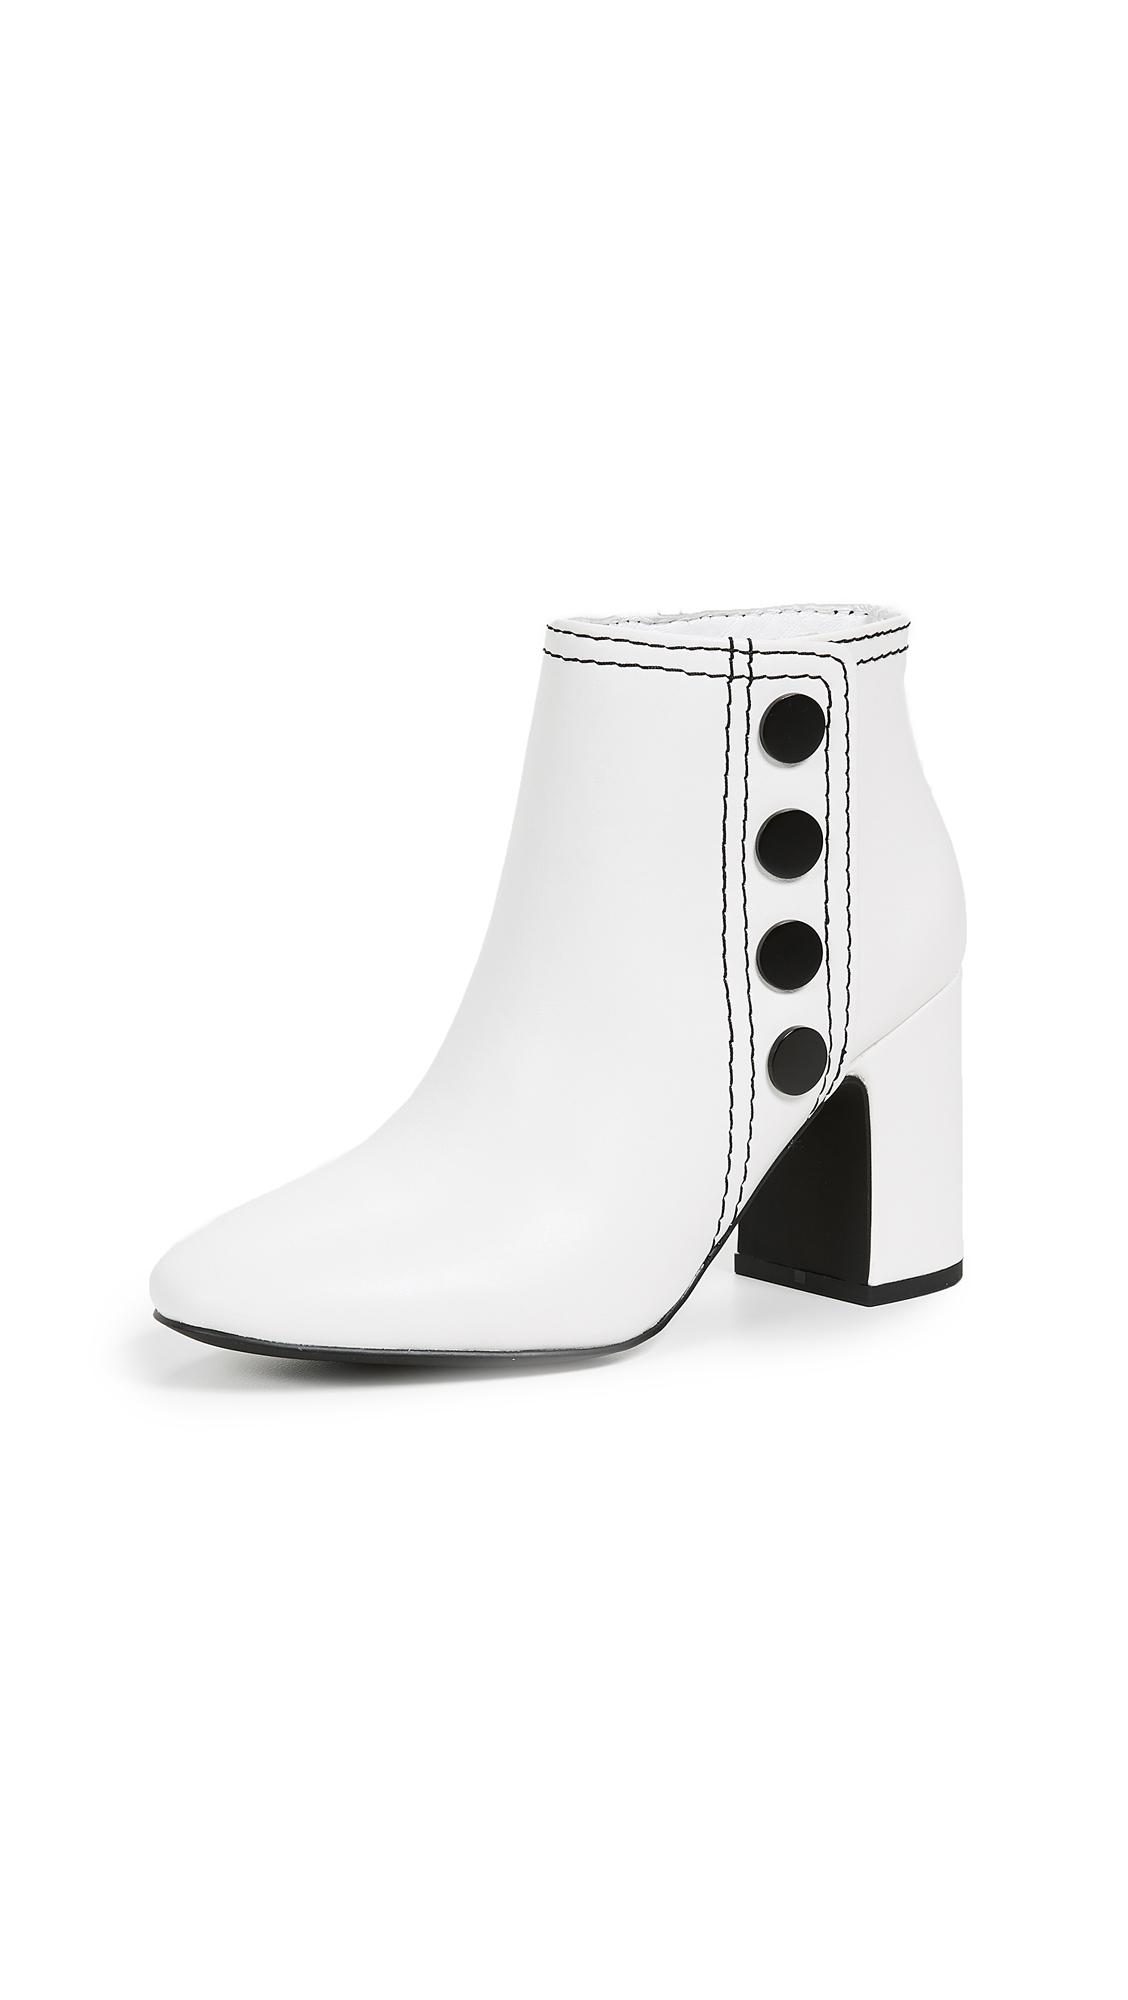 SENSO Jace Block Heel Booties - Ice